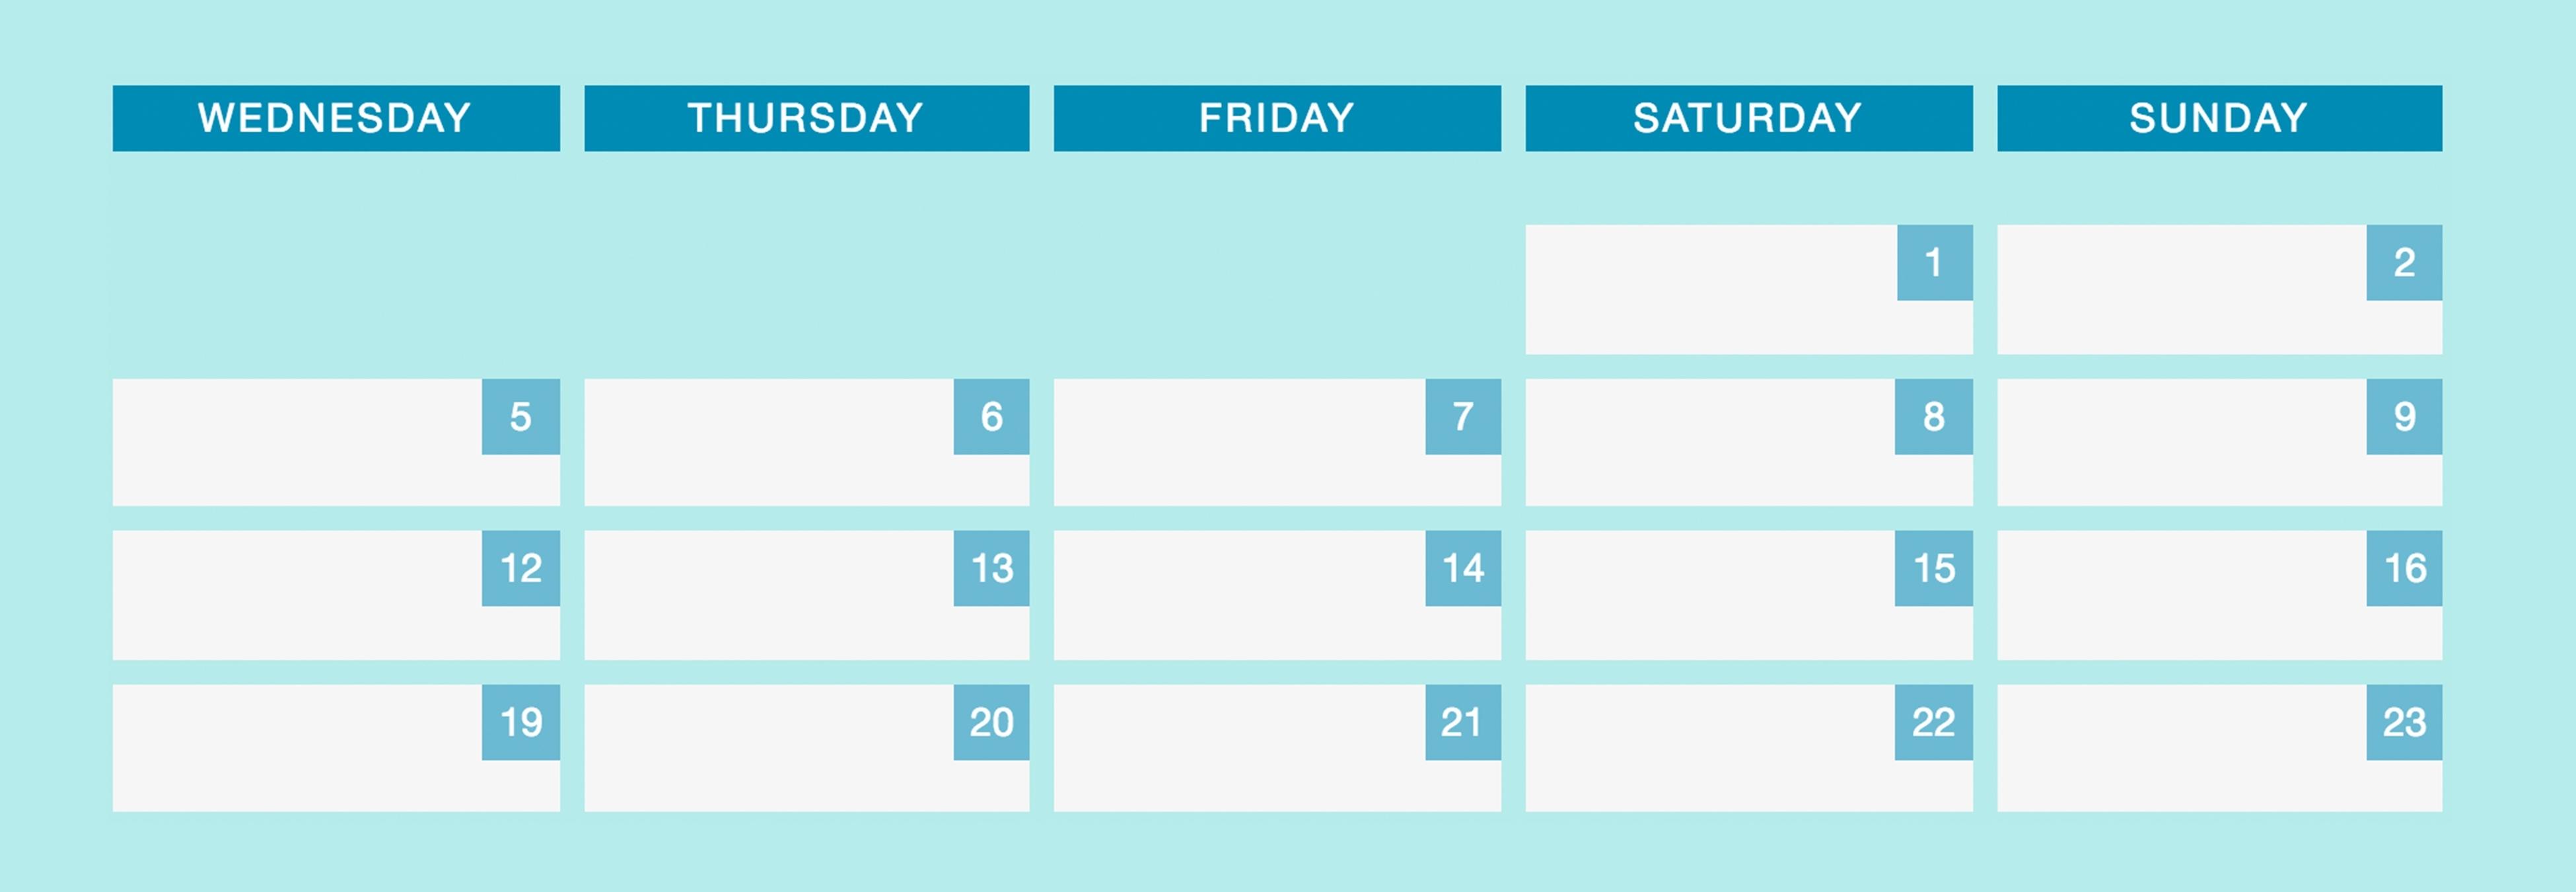 Making A Responsive Calendar For Dynamic Dates Using Flexbox